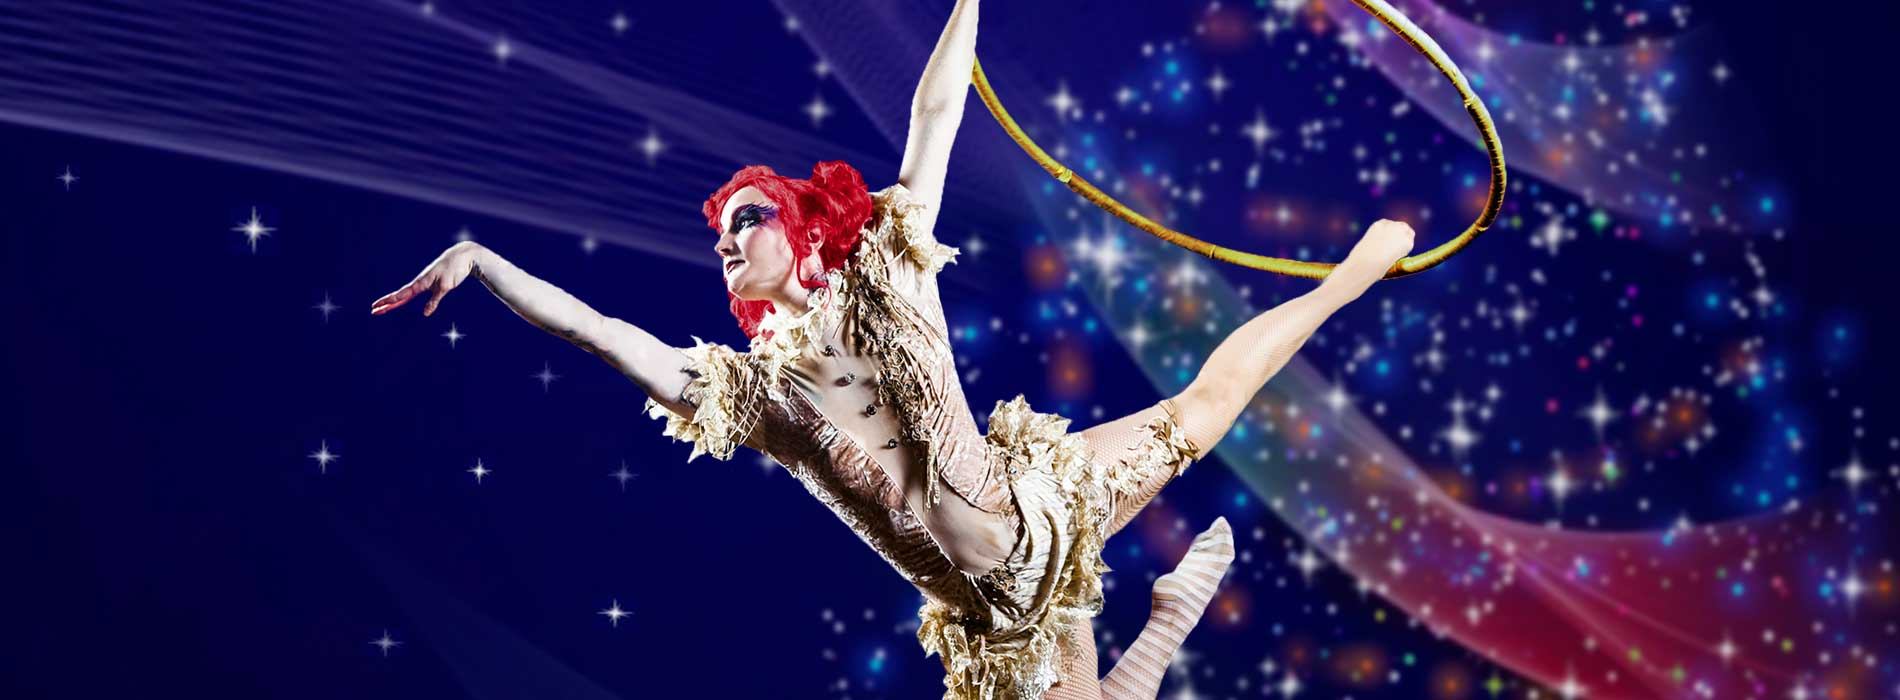 Join us for SeaWorld's Cirque Christmas show.